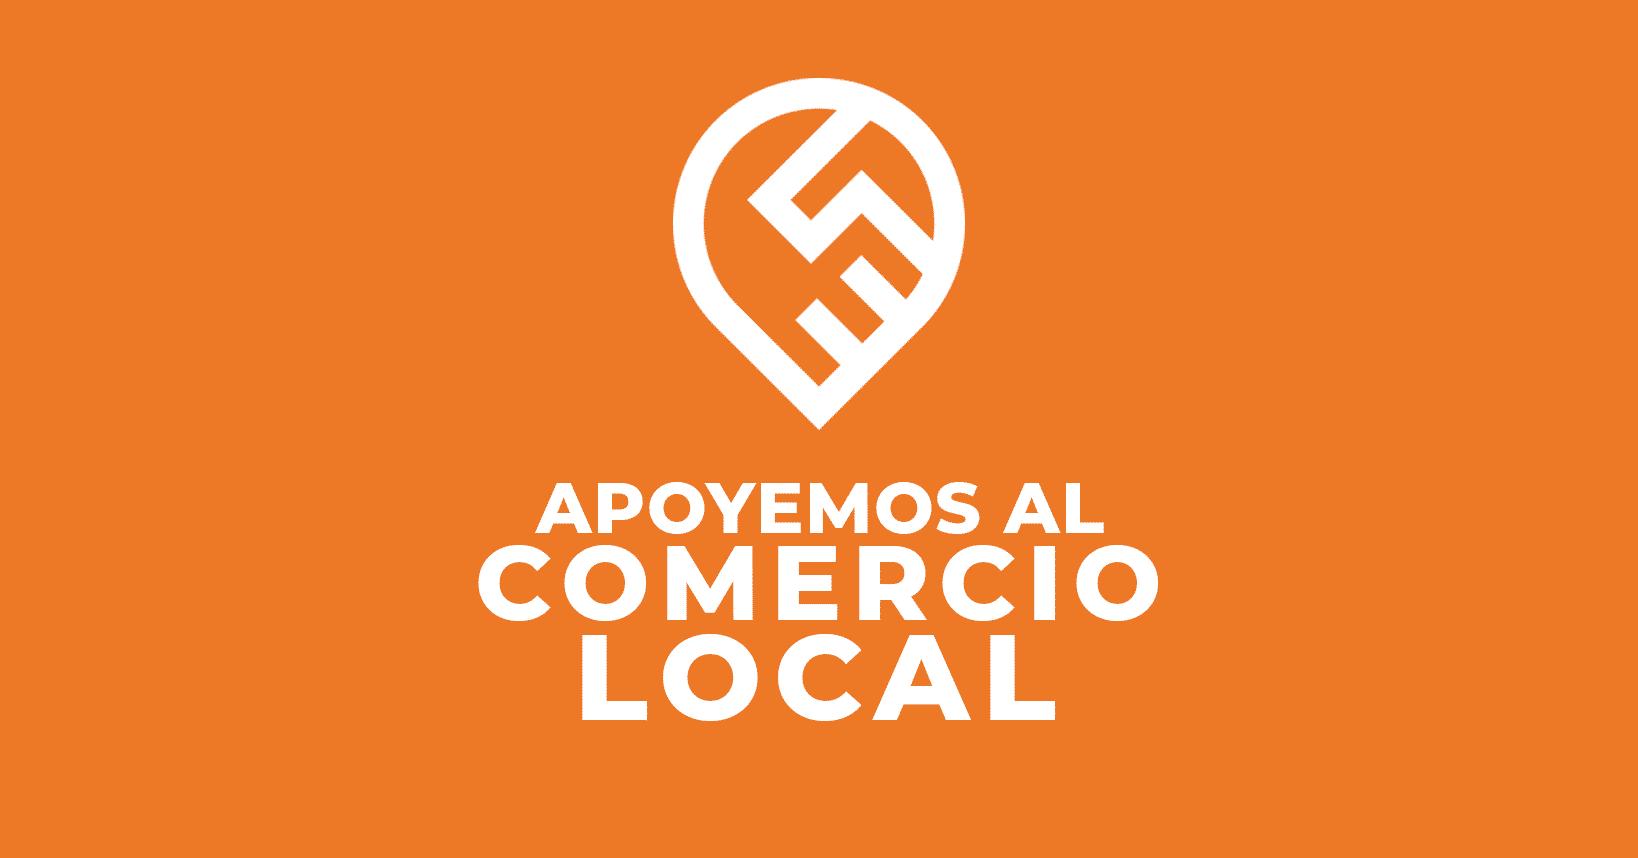 apoyo comercio local